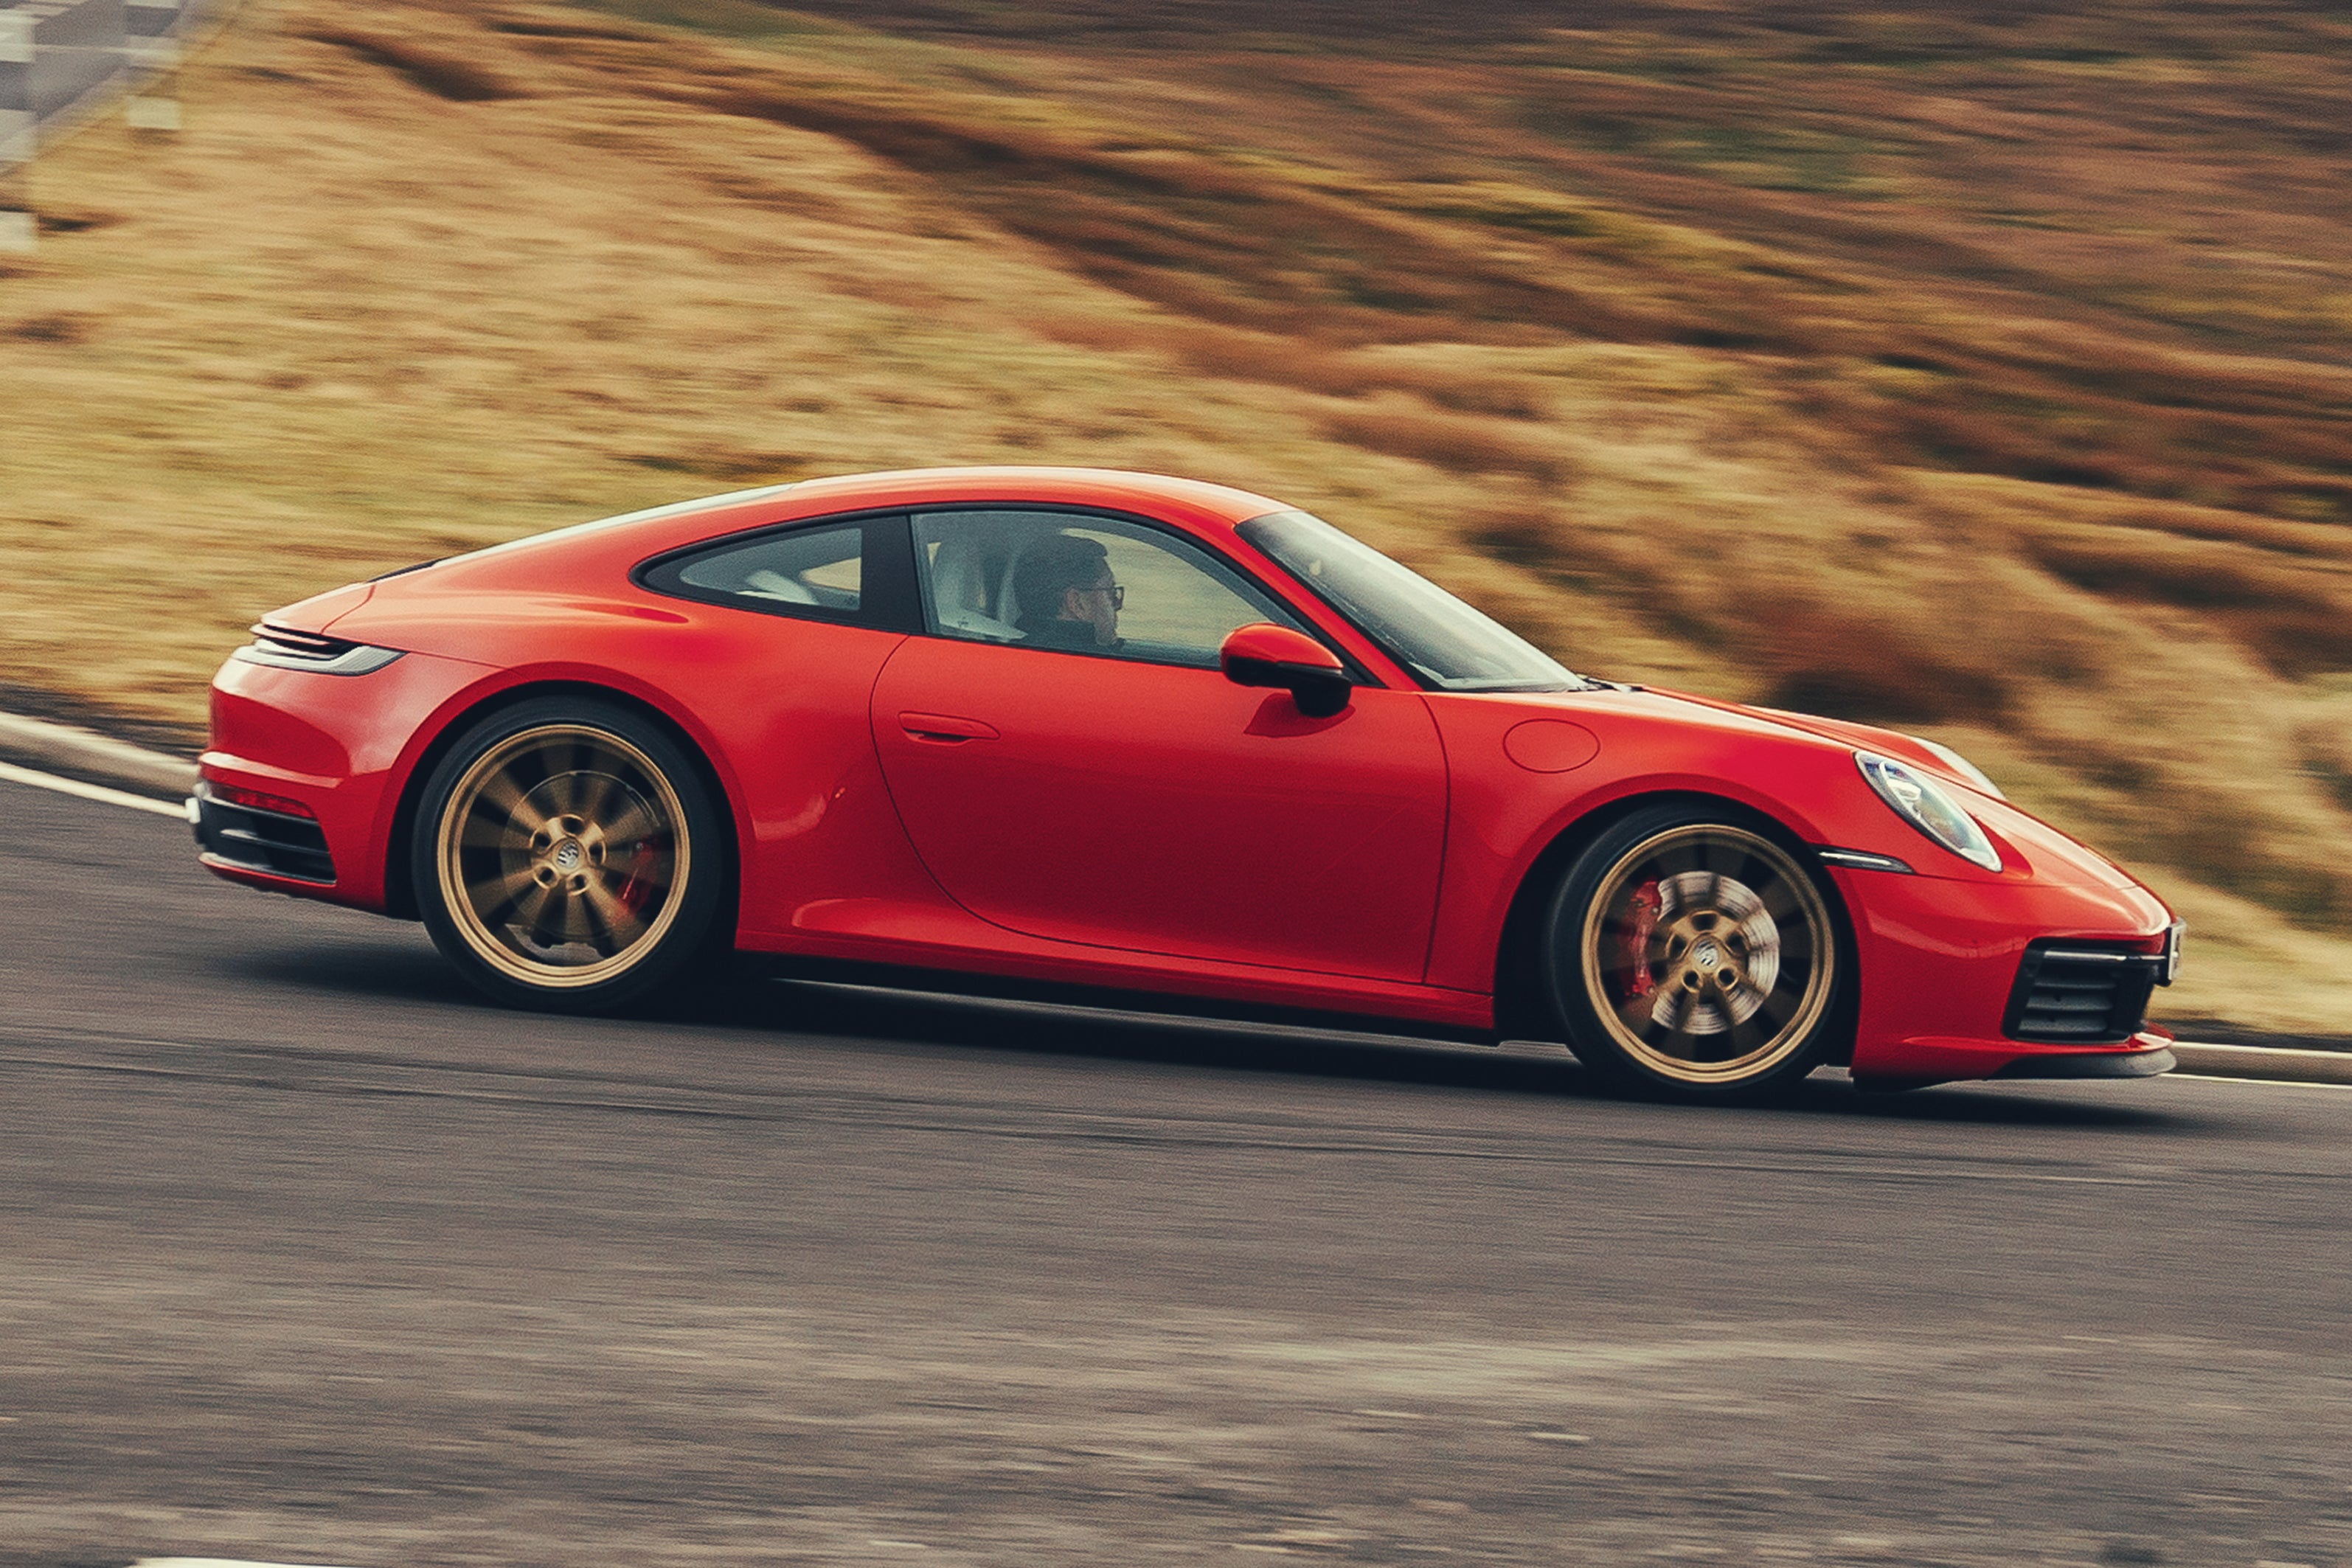 Porsche 911 Right Side View